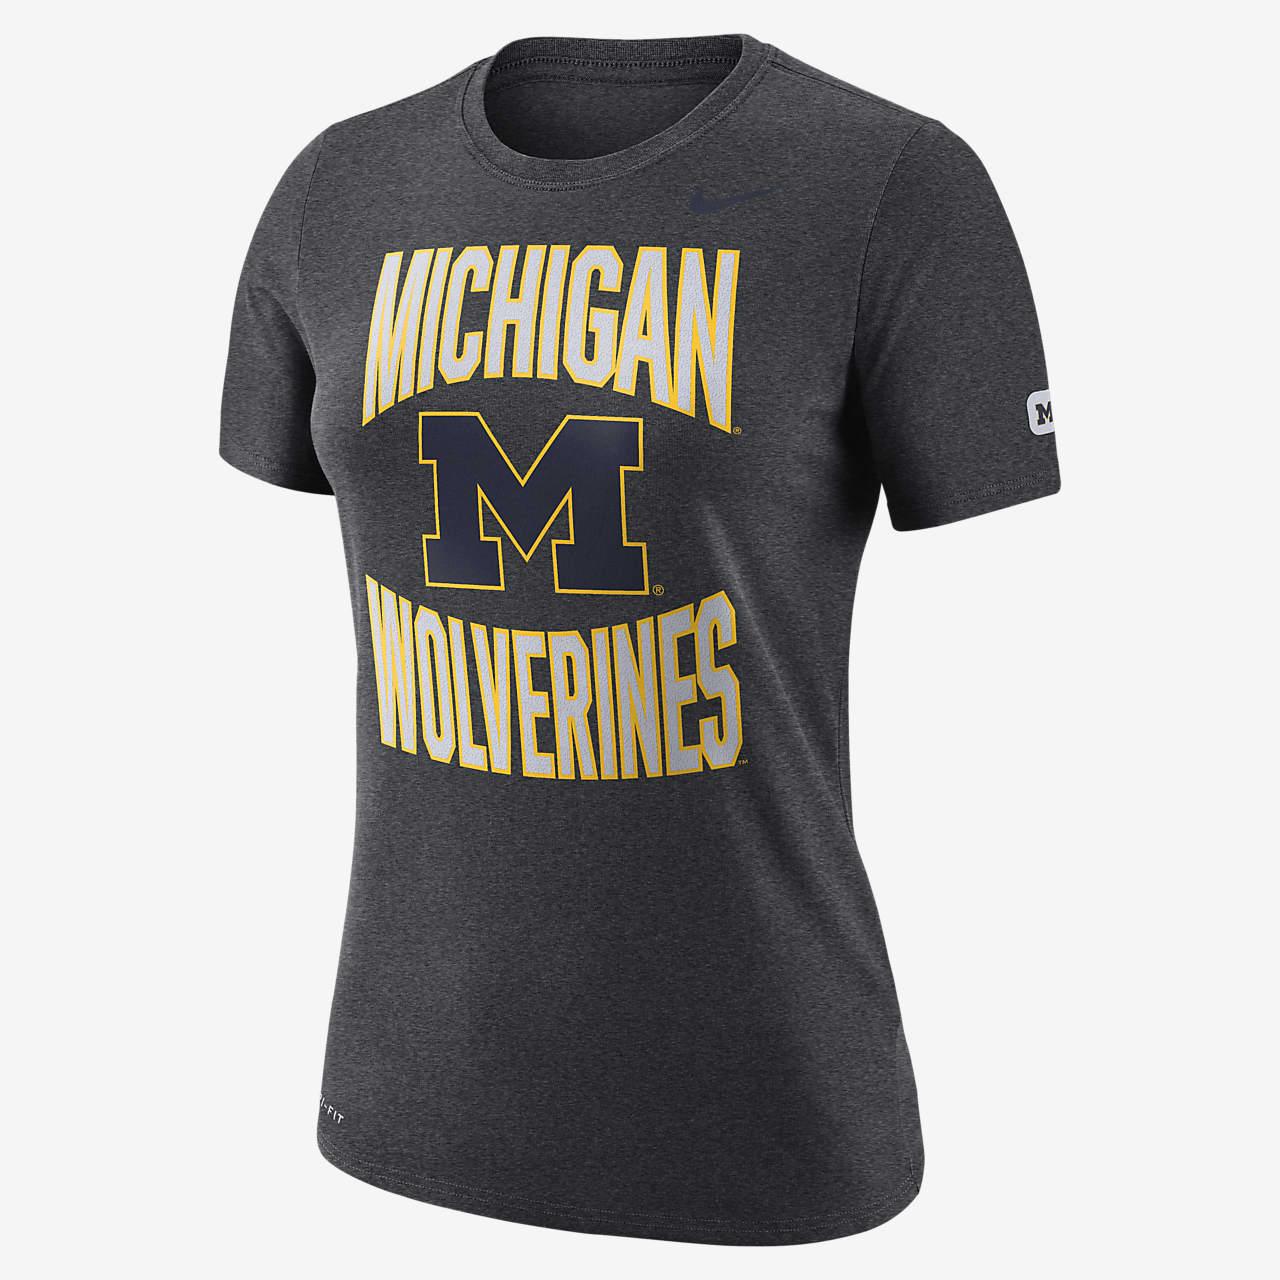 Nike College Dri-FIT (Michigan) Women's T-Shirt